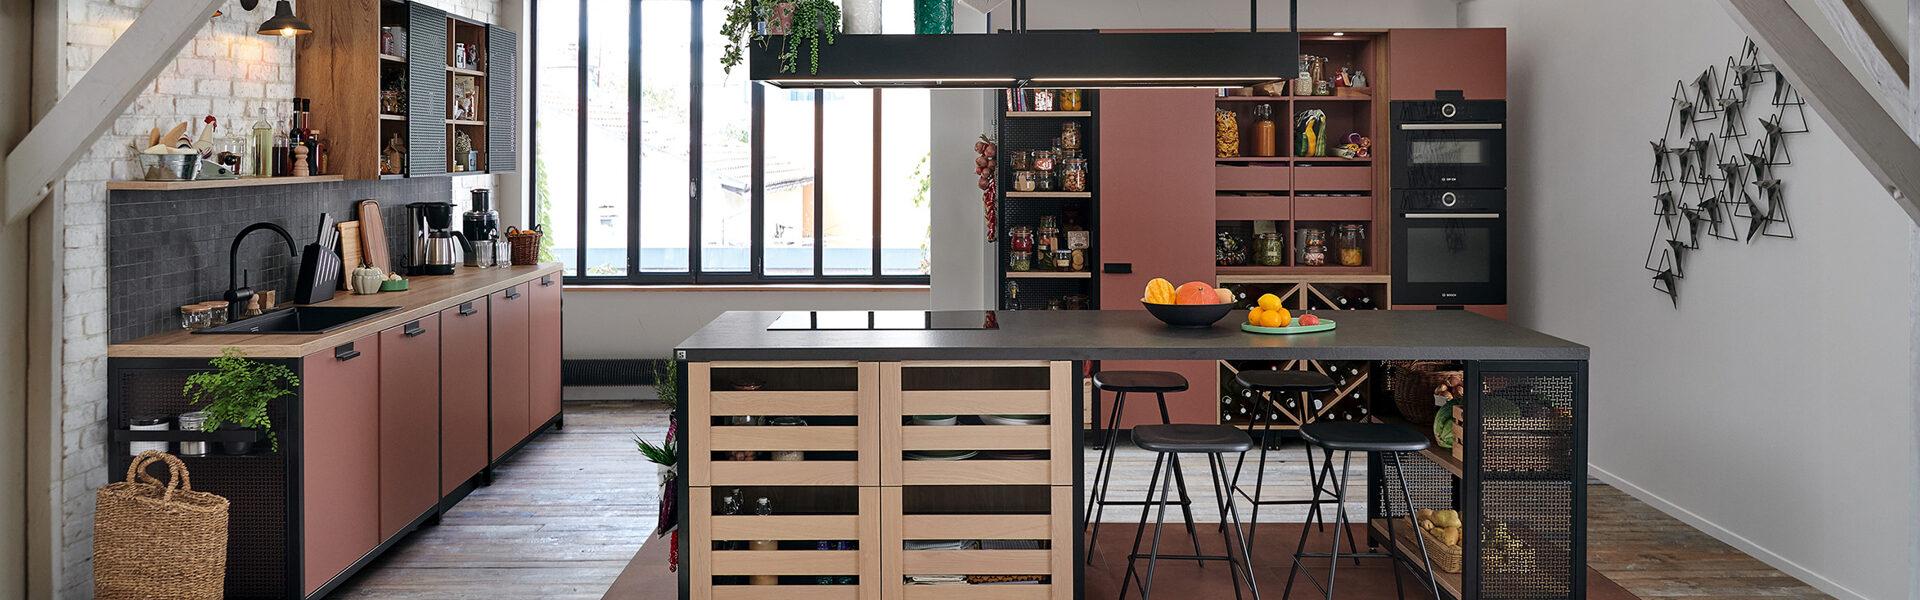 Moderne køkkenalrum